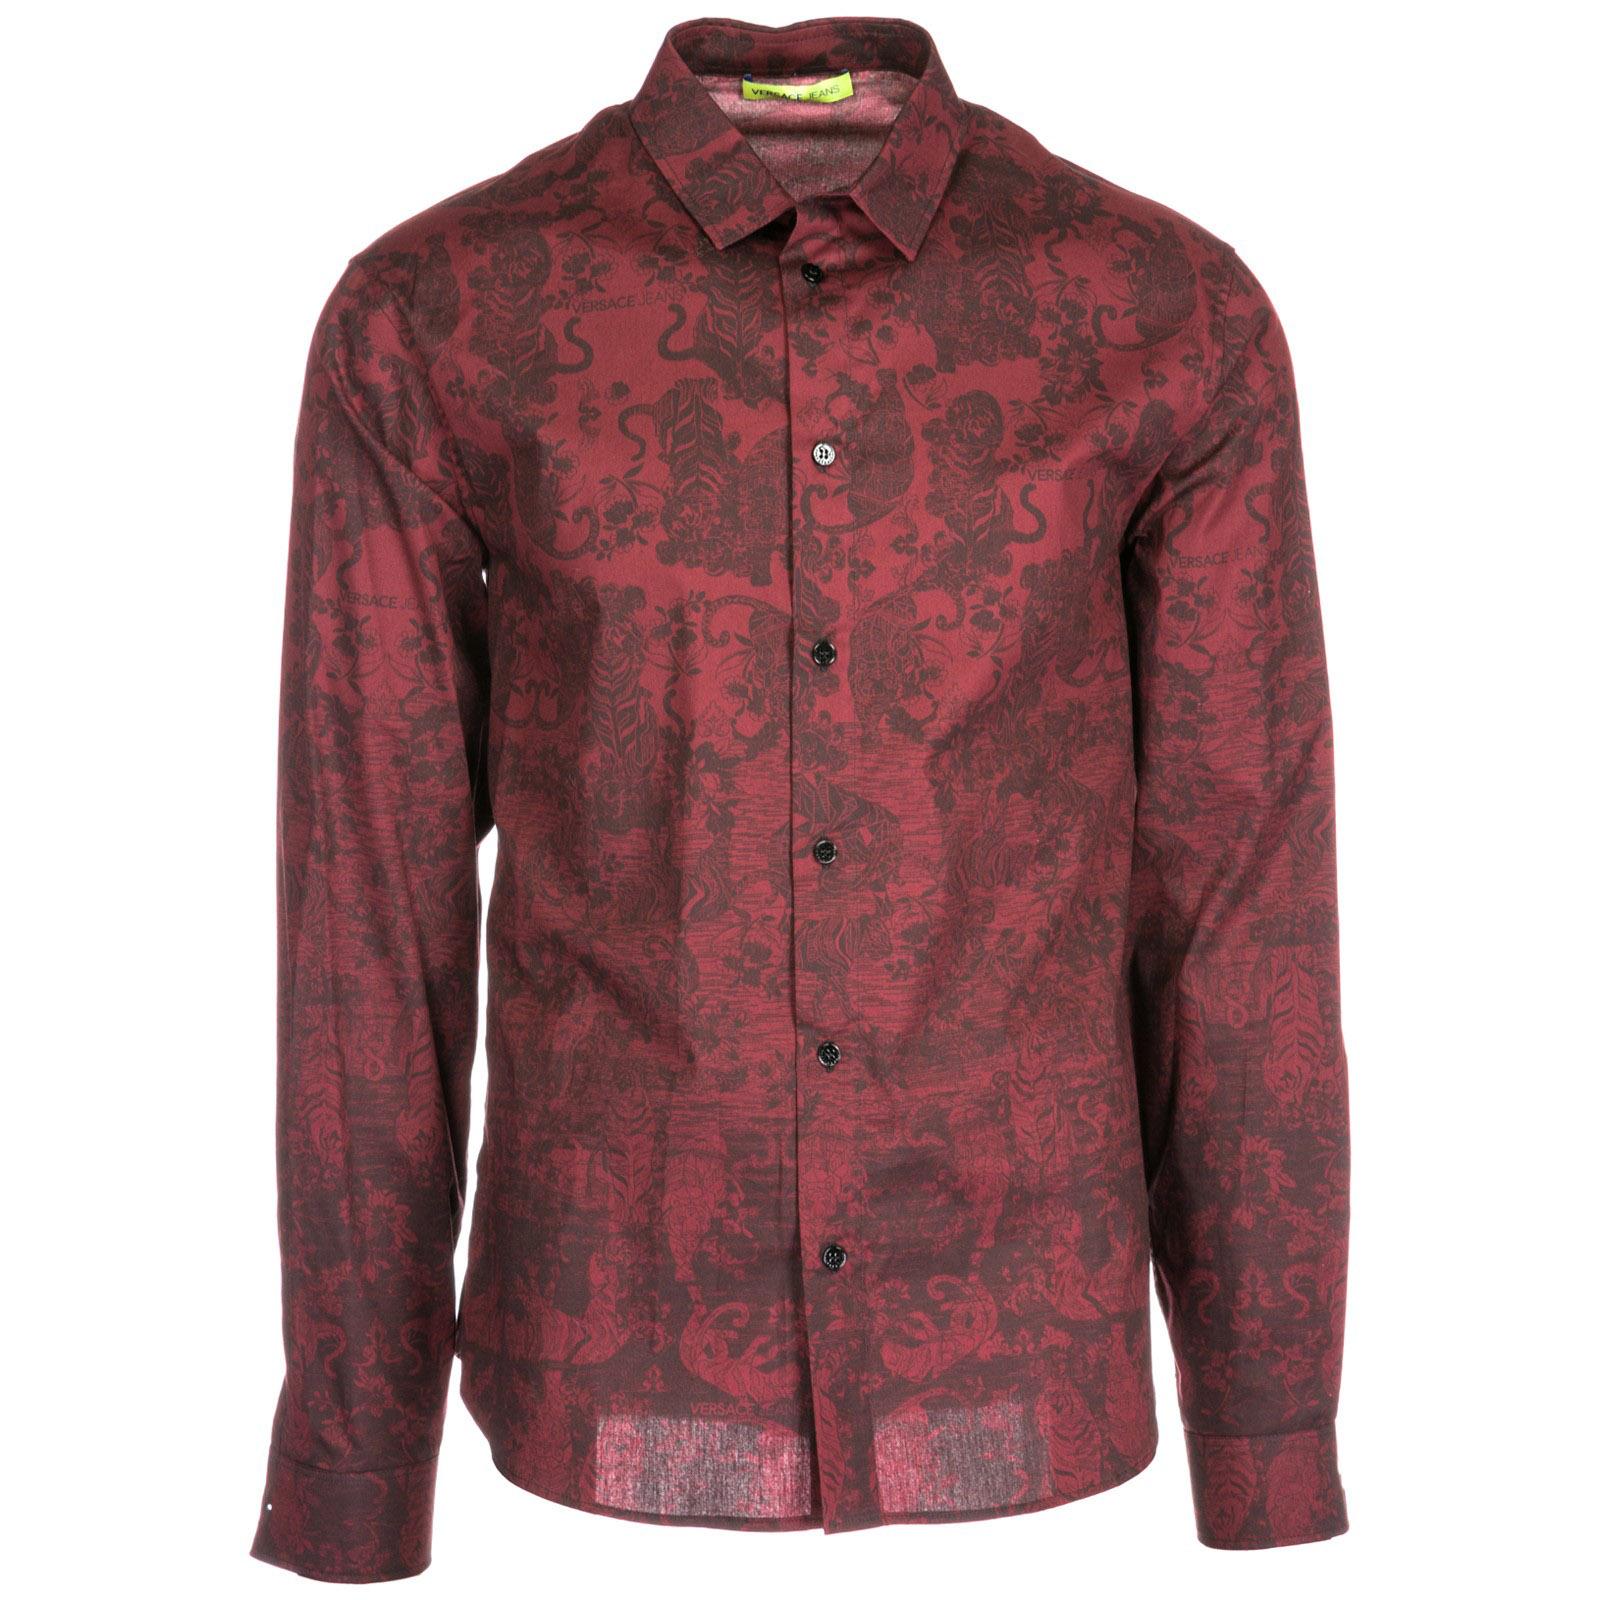 ff93fe8a7035b47 Рубашка Versace Jeans B1GSA6R5 bordeaux | FRMODA.com